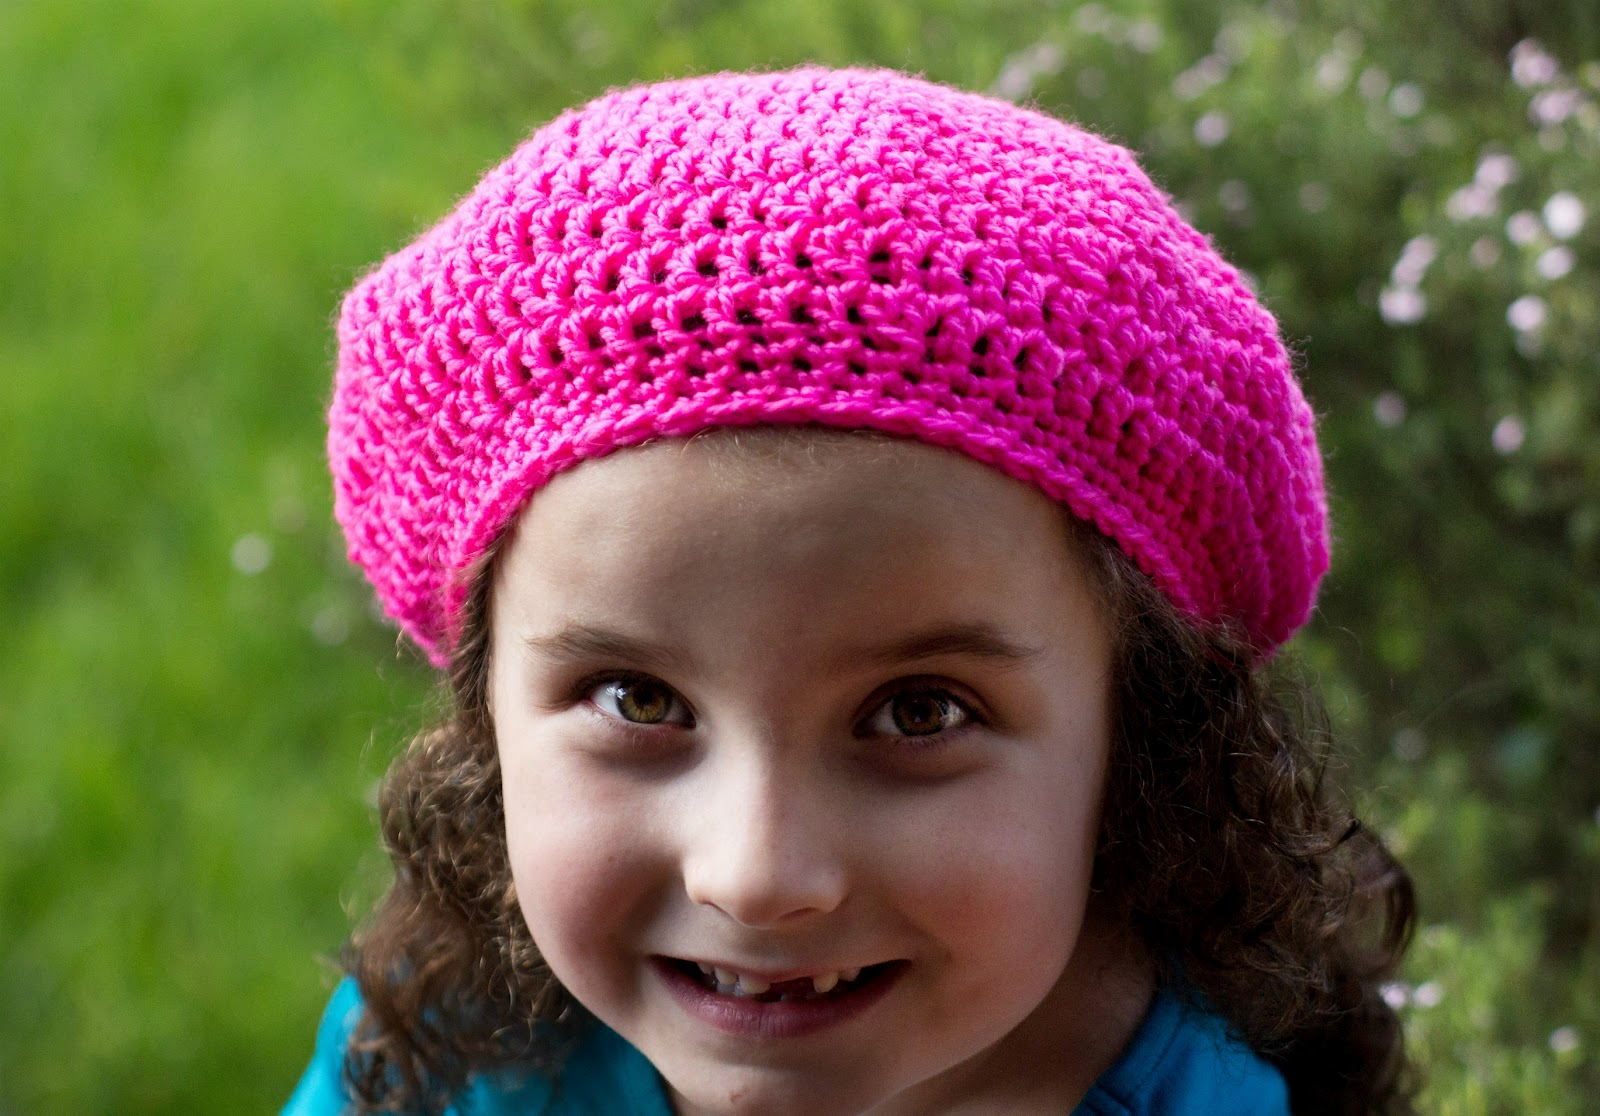 Crochet Beanie Pattern Basic : Hopeful Honey Craft, Crochet, Create: Back to Basics ...